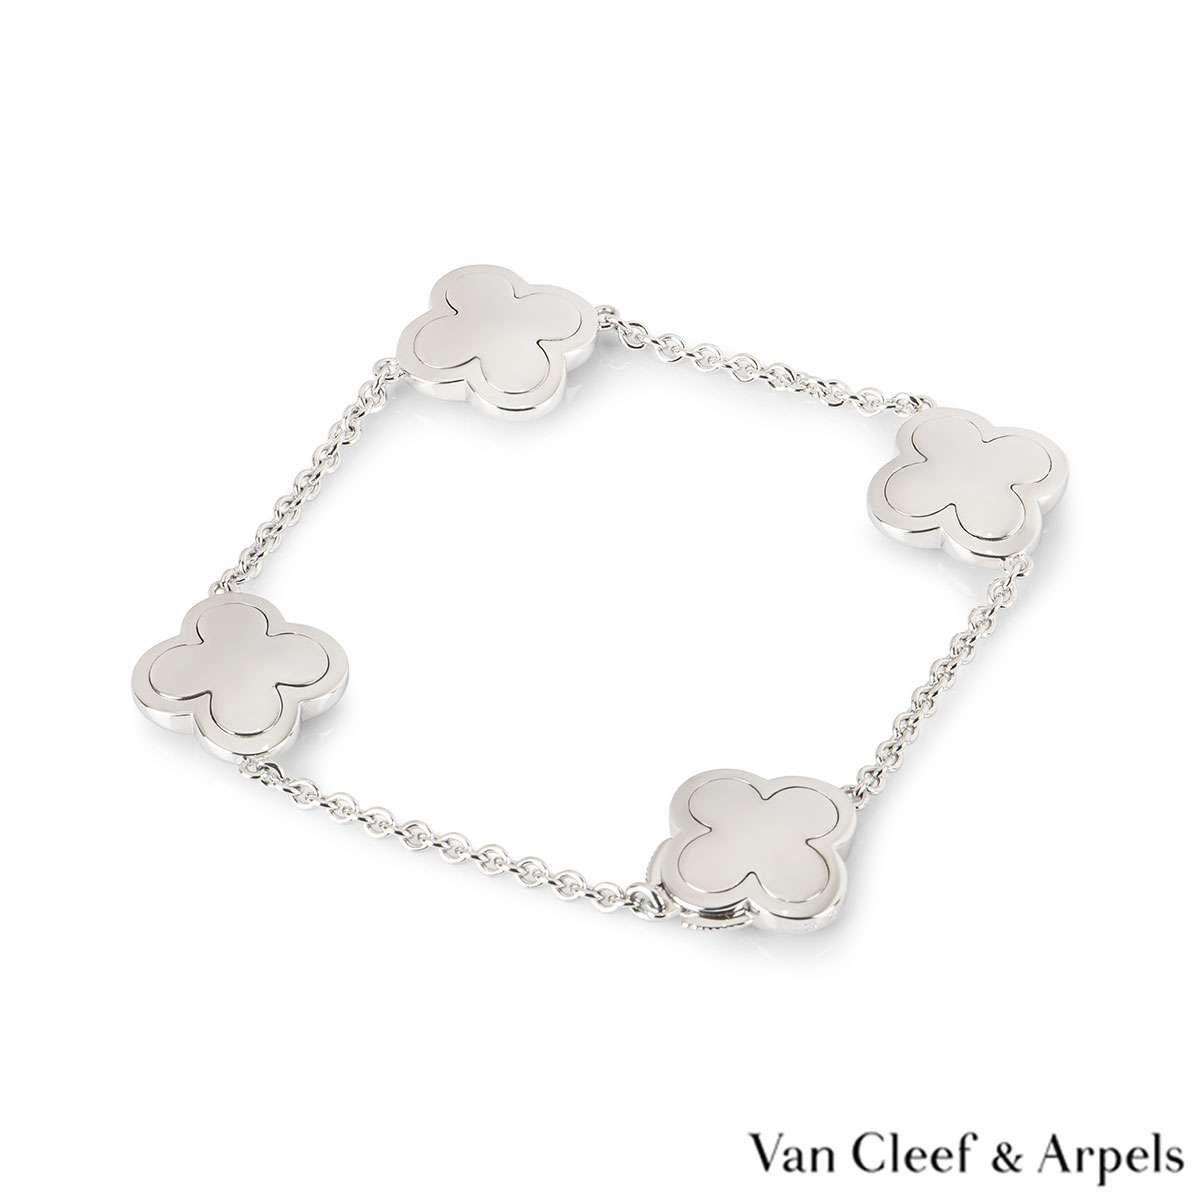 Van Cleef & Arpels White Gold Alhambra Bracelet